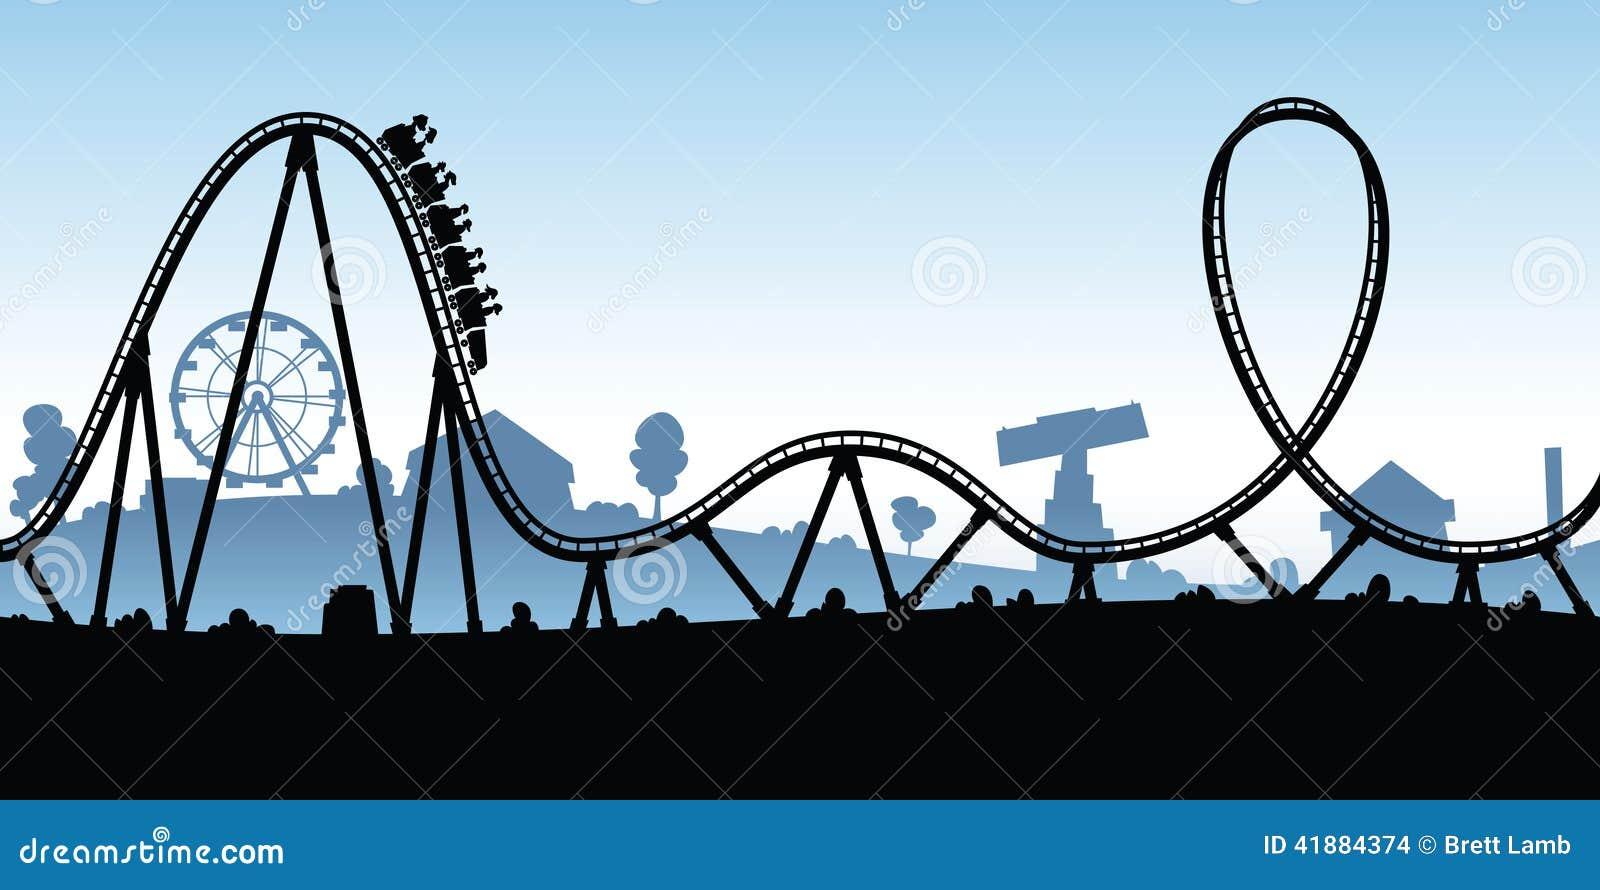 Stock Illustration Cartoon Rollercoaster Silhouette Amusement Park Image41884374 on The United States Worksheet